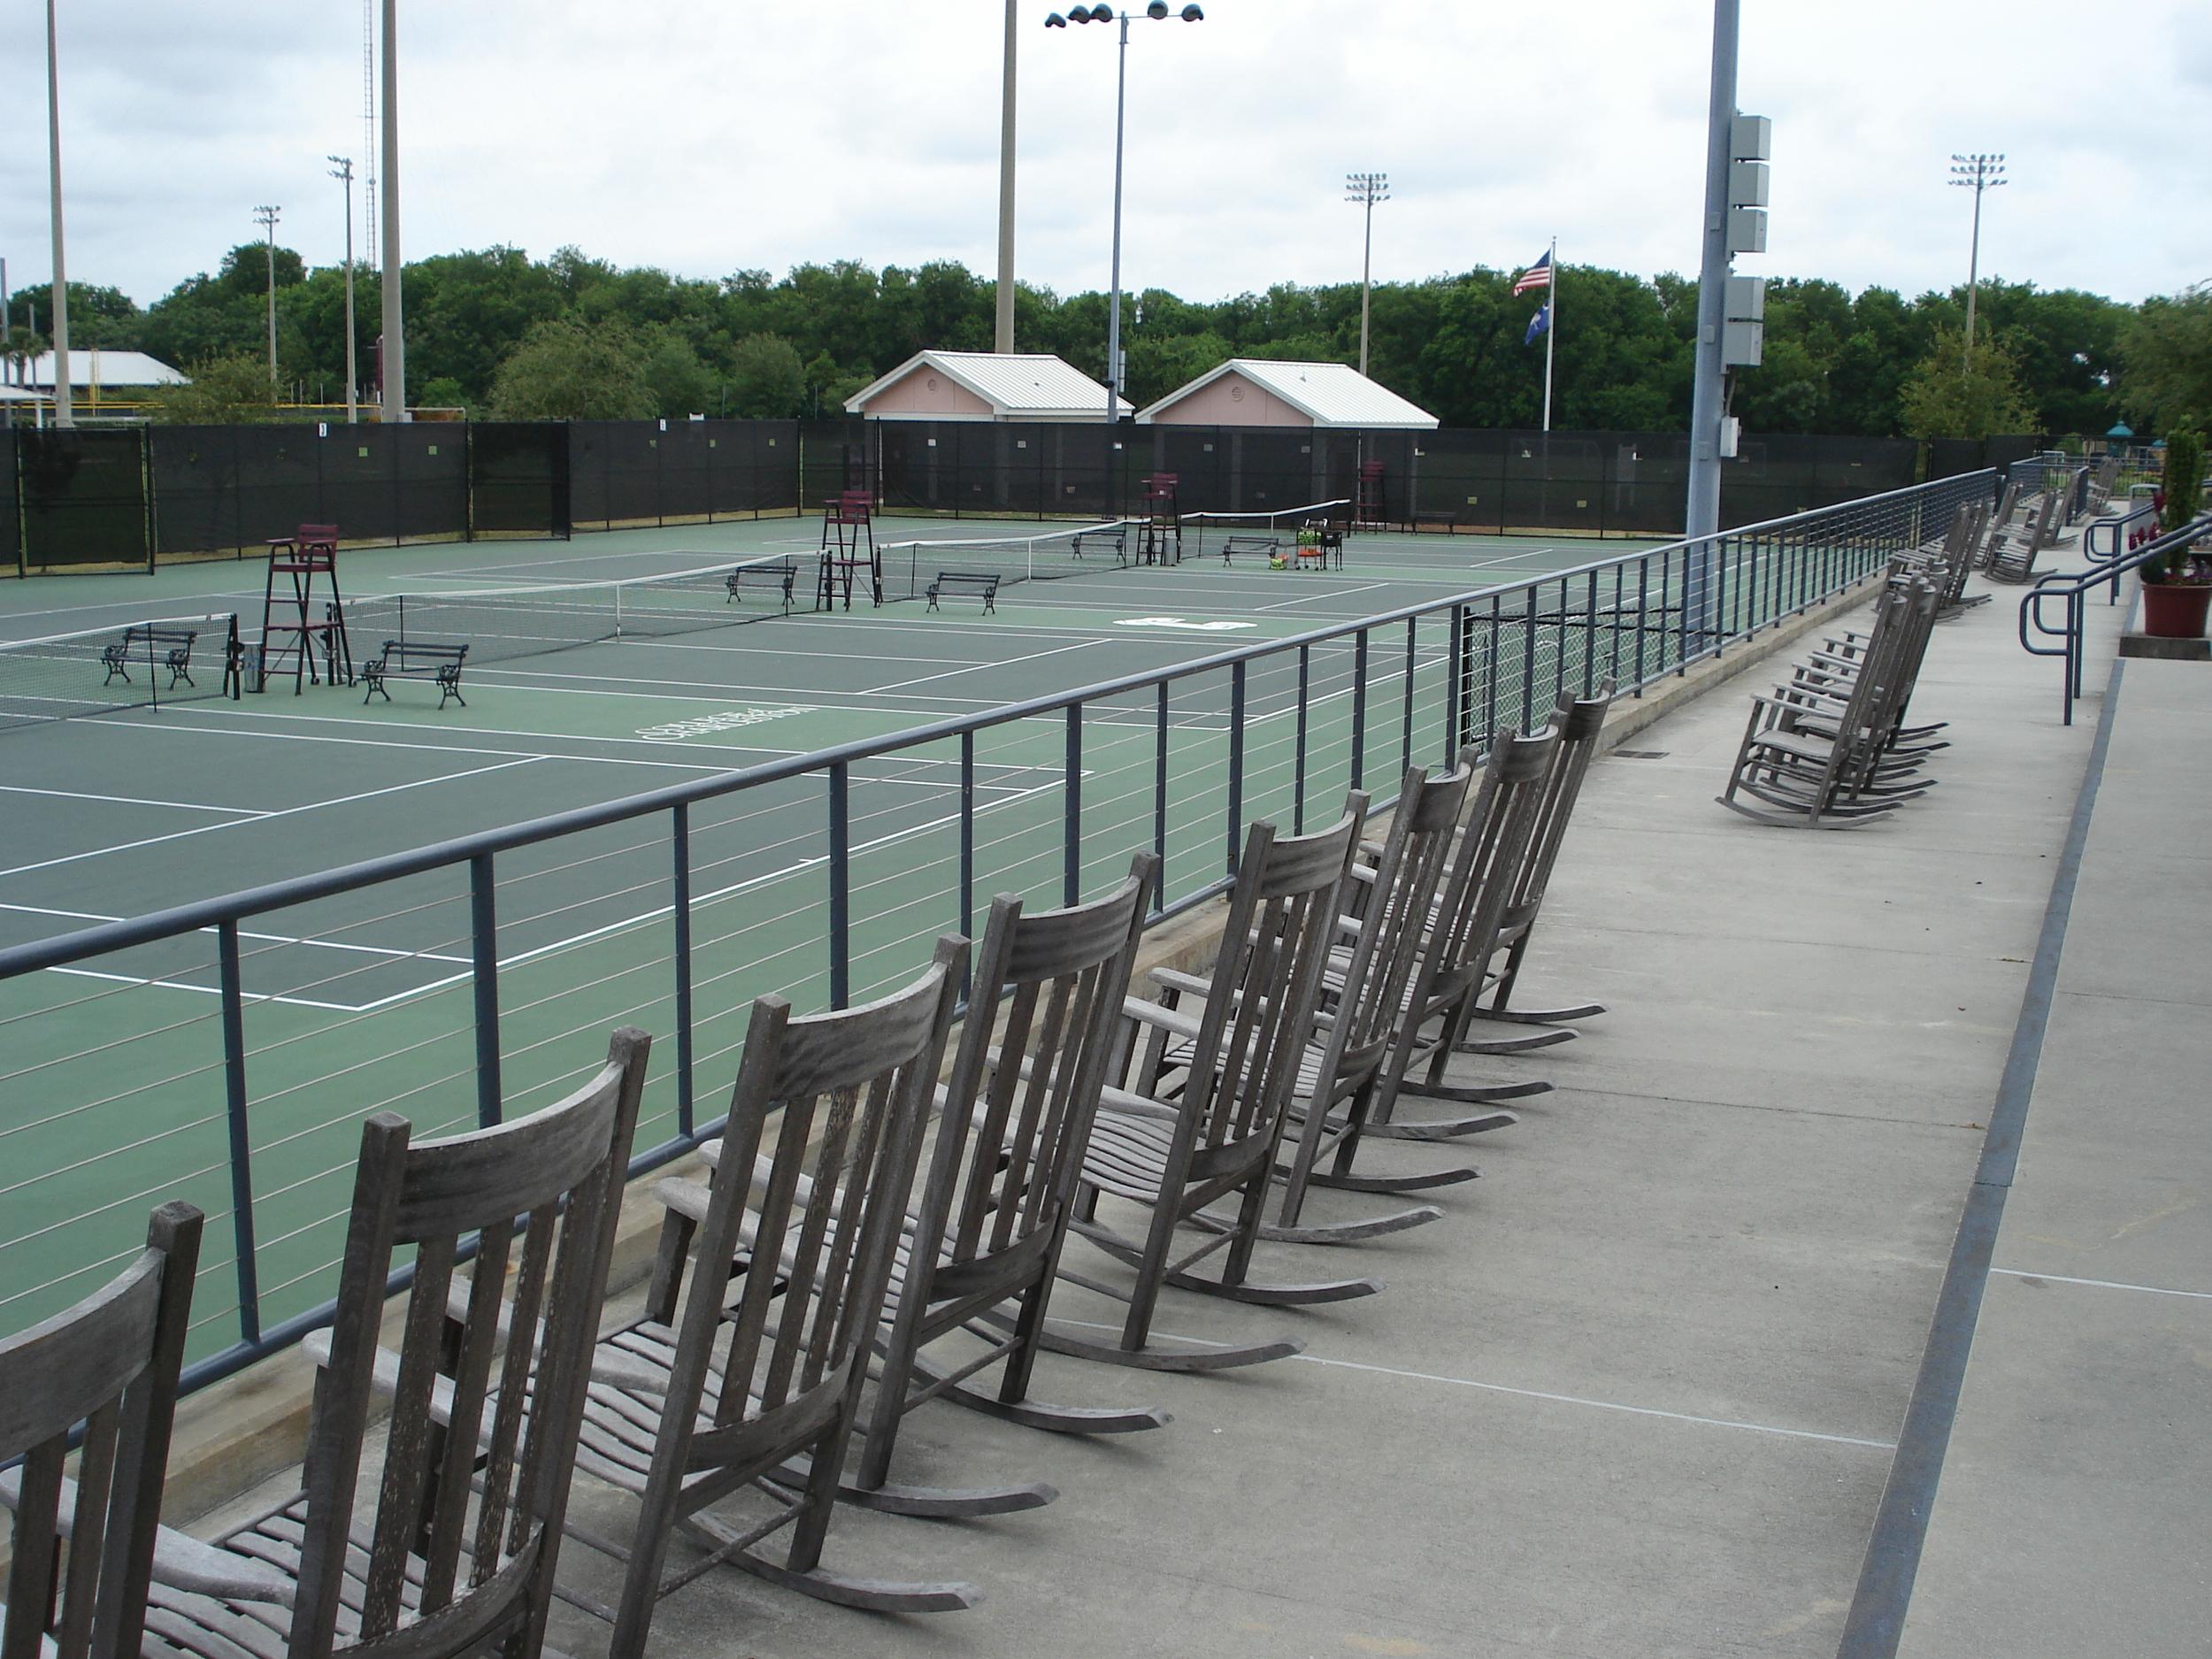 cofc tennis 02.jpg